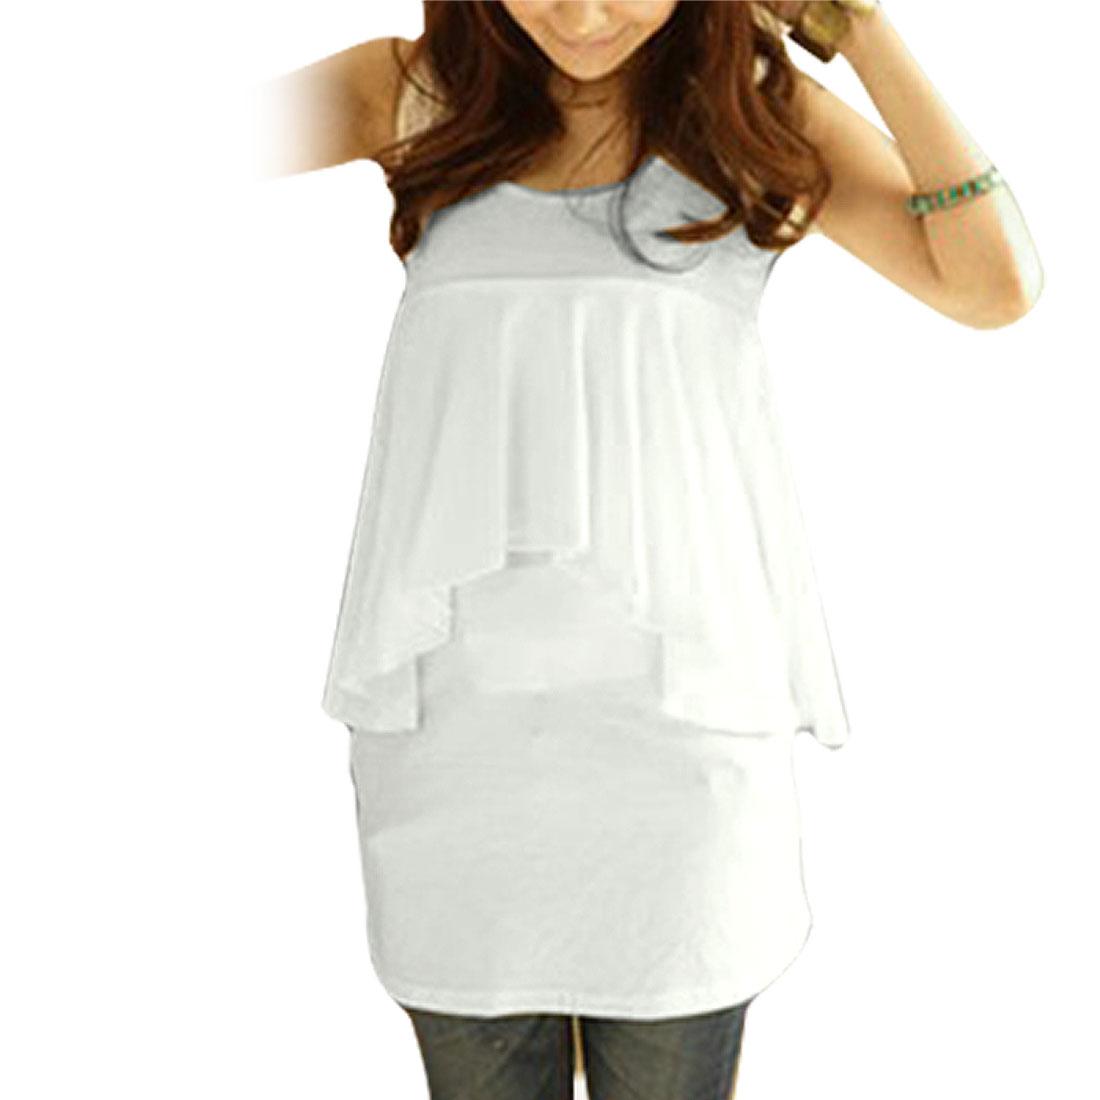 Lady White Scoop Neck Ruffled 2 Fer Design Tunic Shirt S